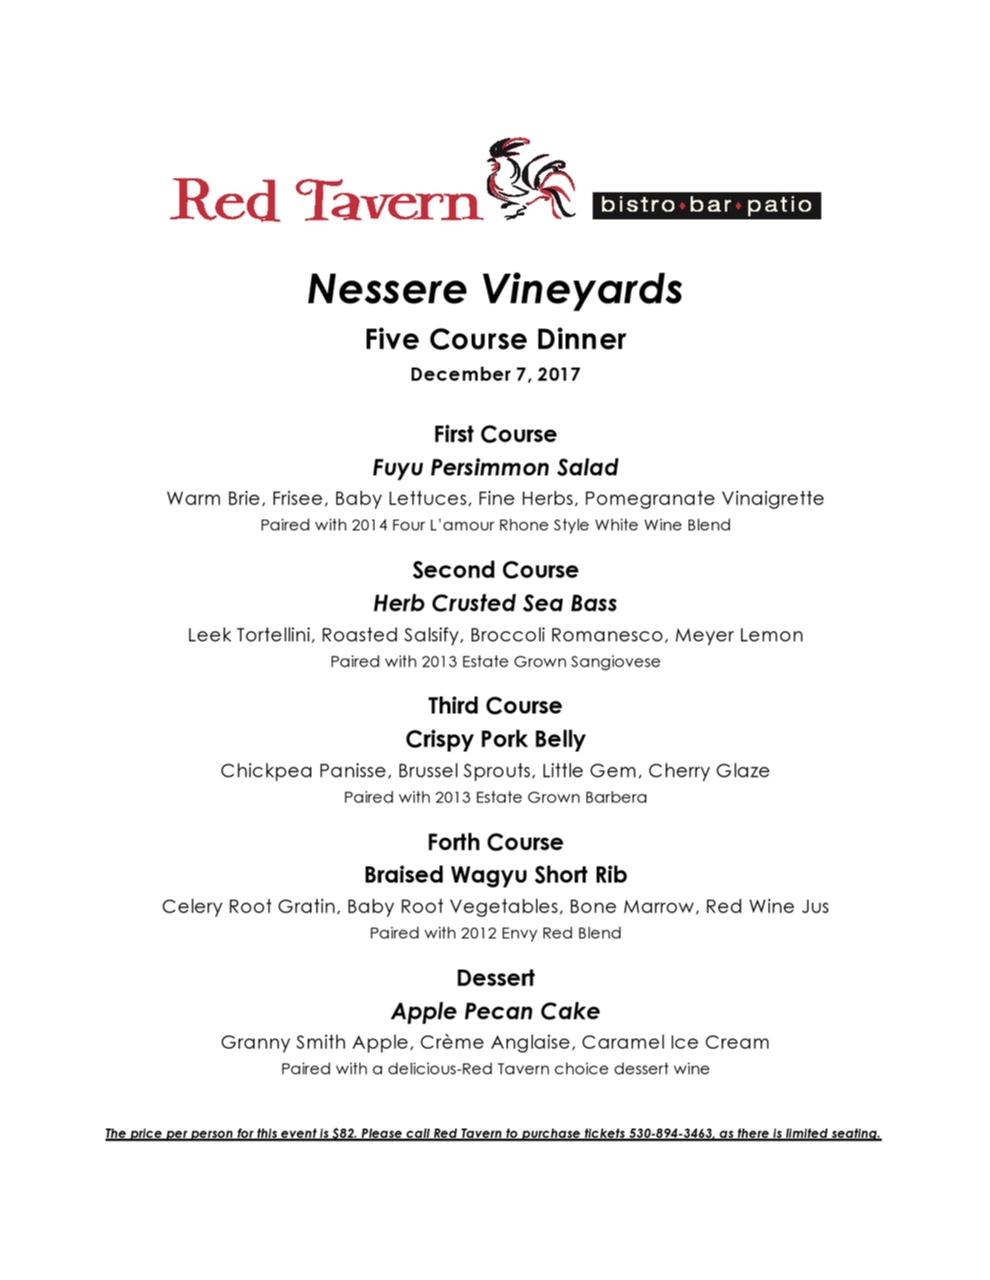 Red Tavern upcoming event: Nessere Vineyards Wine Maker's Dinner – December 7th, 2017